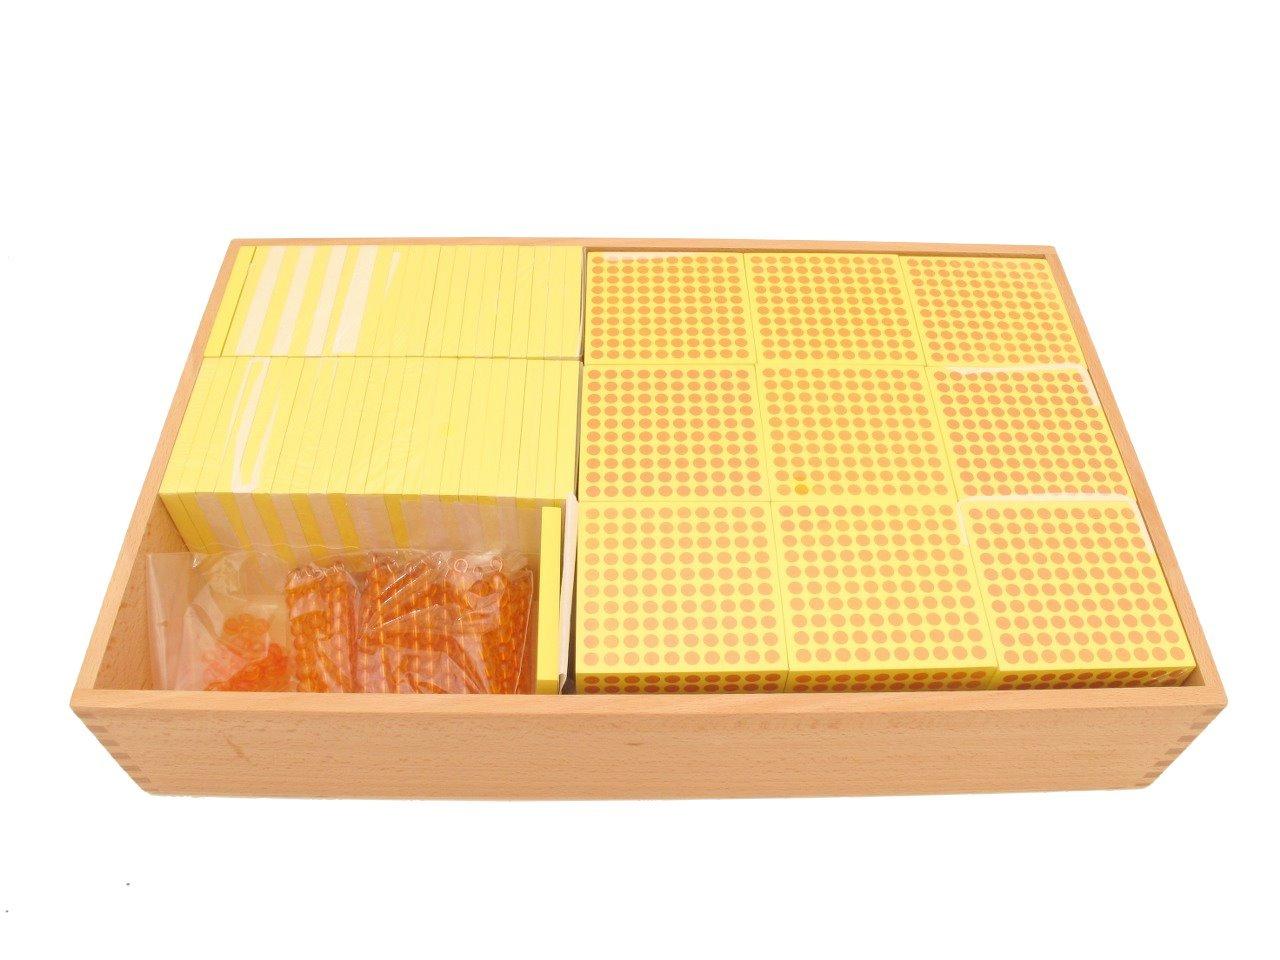 Montessori Decimal System Combination Tray (100-1000) by PinkMontessori